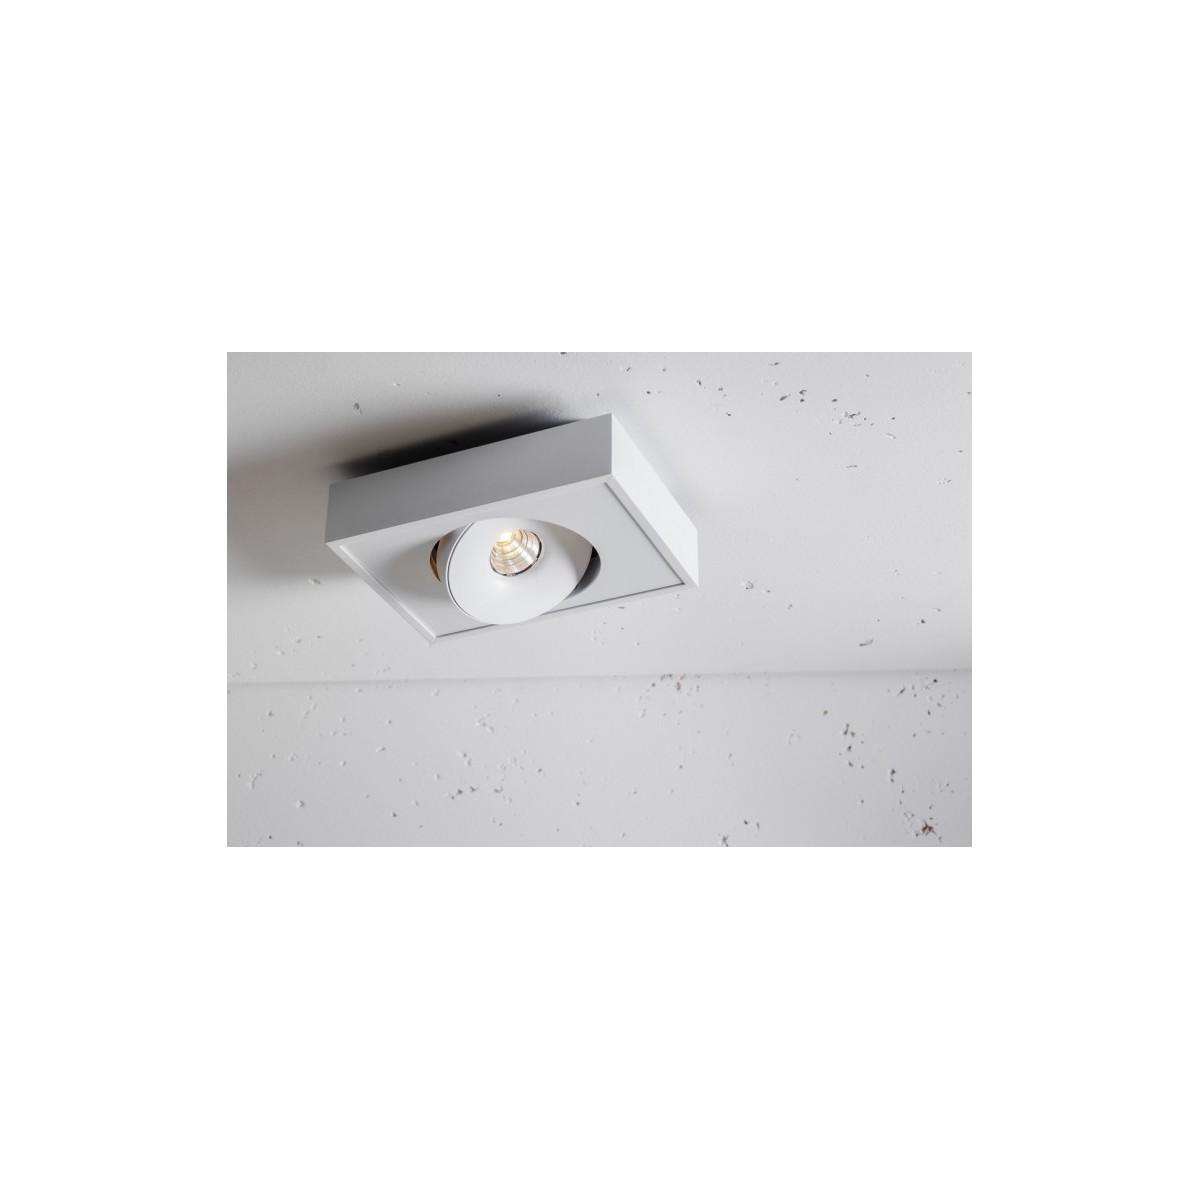 Labra LAVA 1 NT edge.LED 1x 7.5W 3-0725 Sufitowa